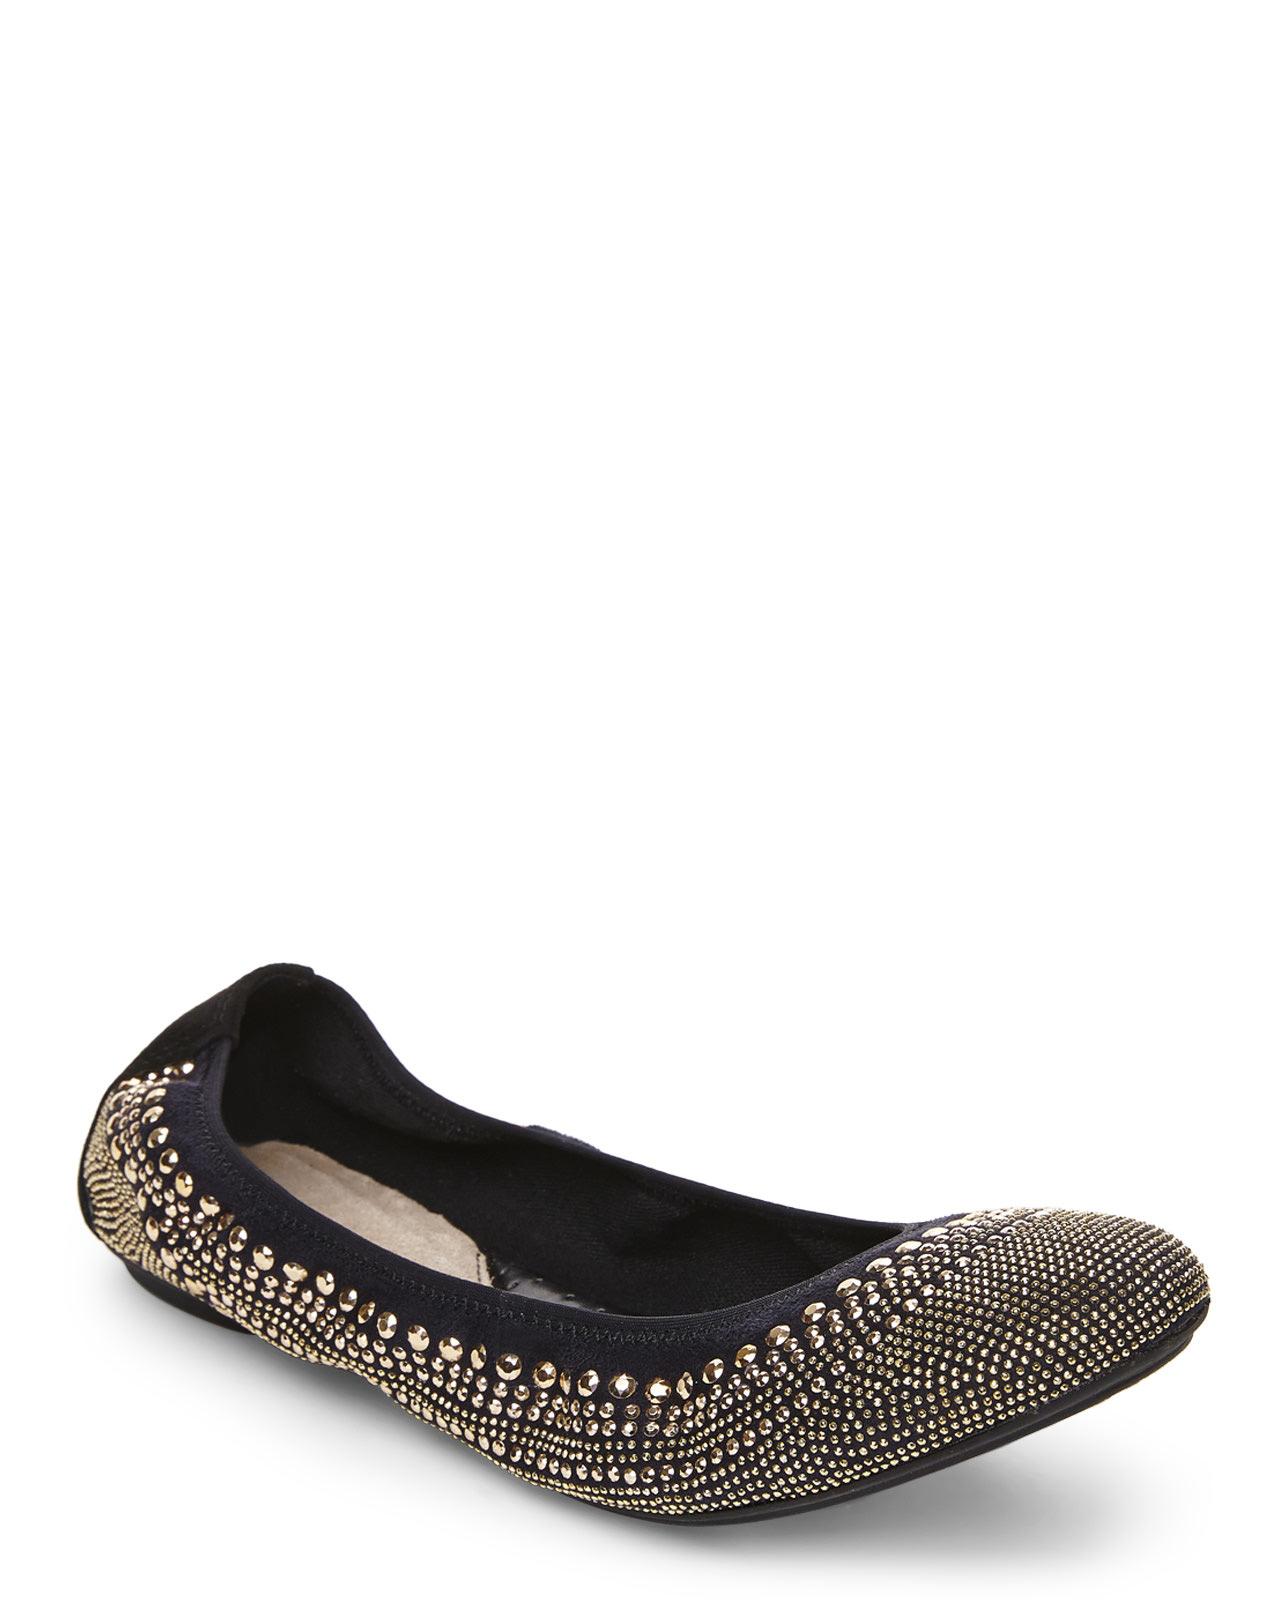 2edc51cfaba Lyst - Hush Puppies Gold   Black Chaste Ballet Flats in Metallic